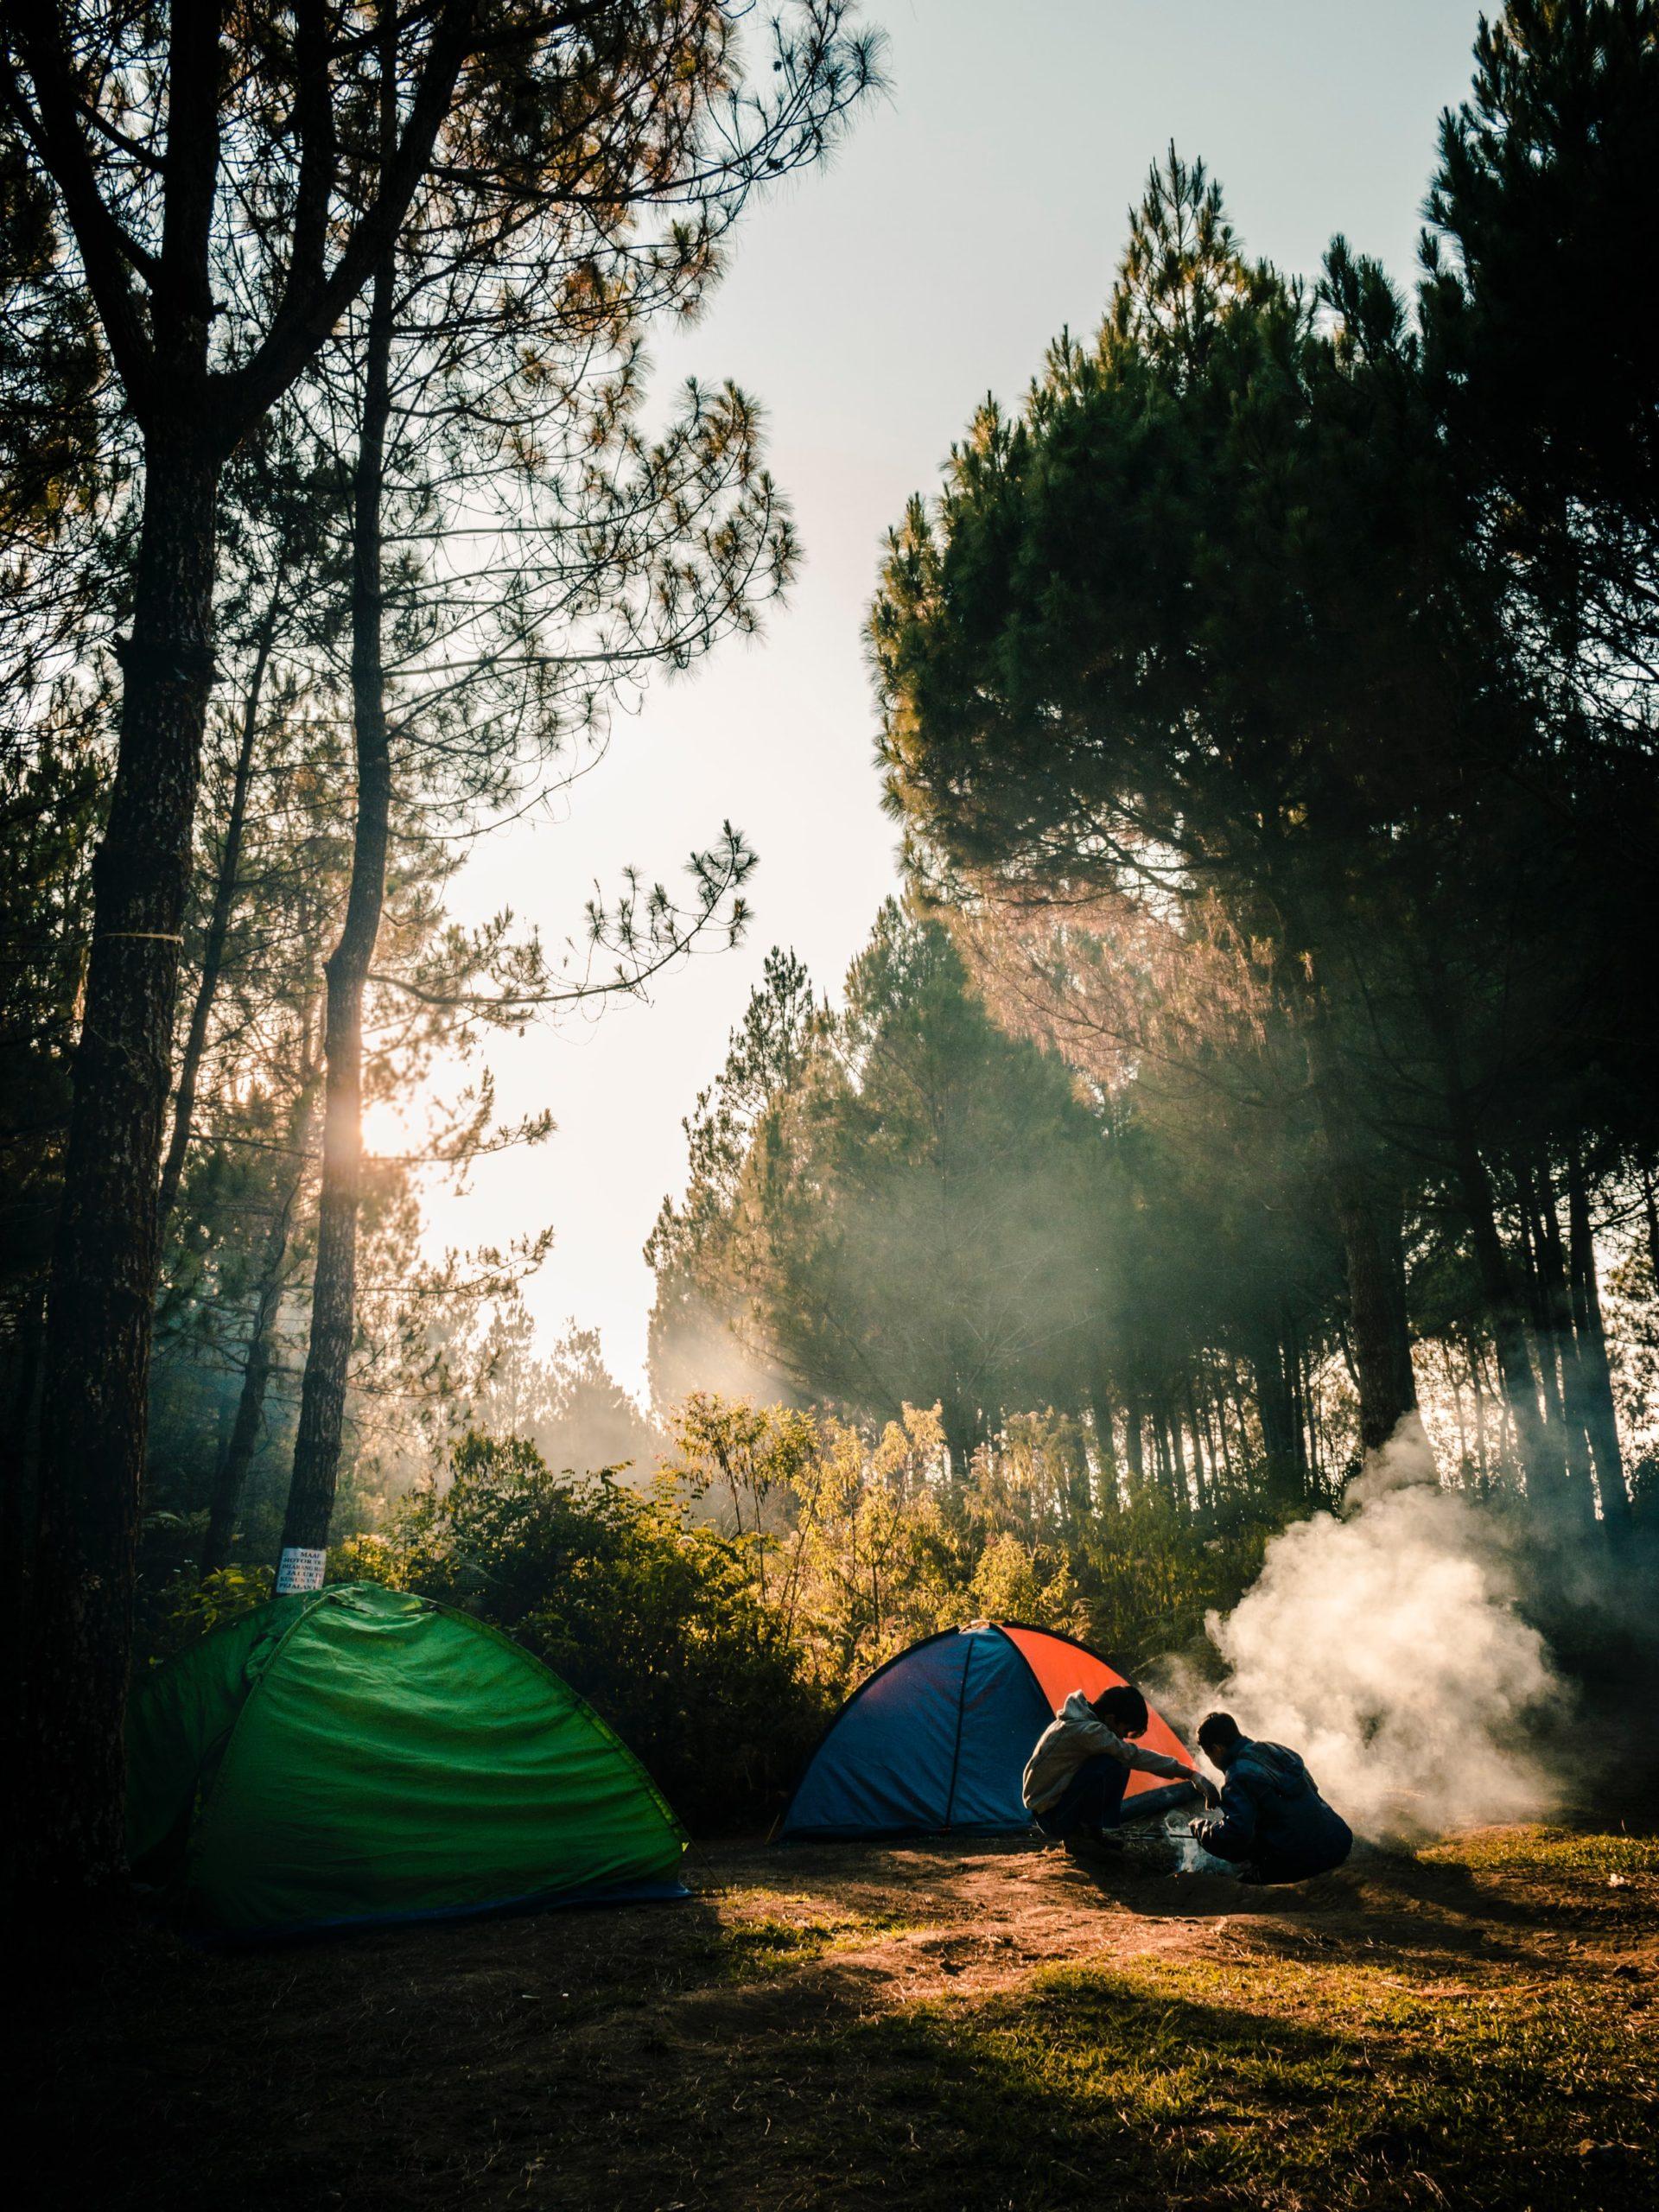 frankreich-campingplätze-wald-zelte